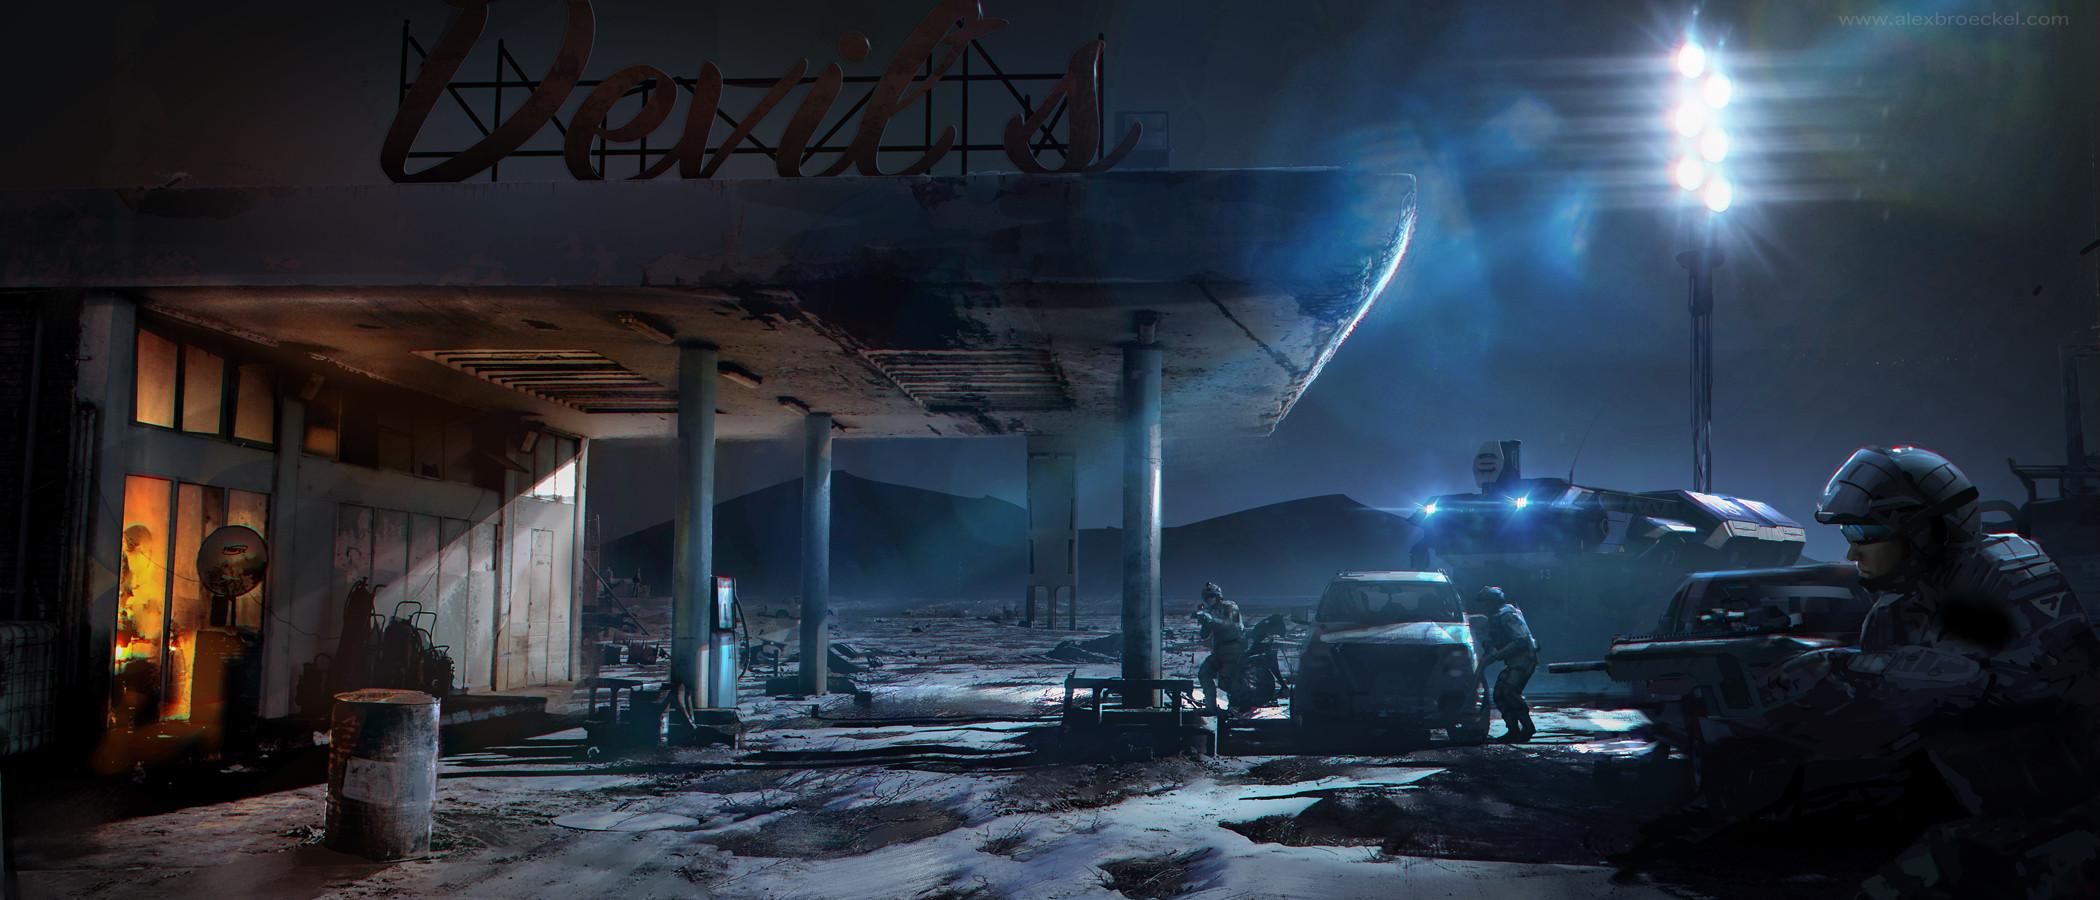 abandoned gast station